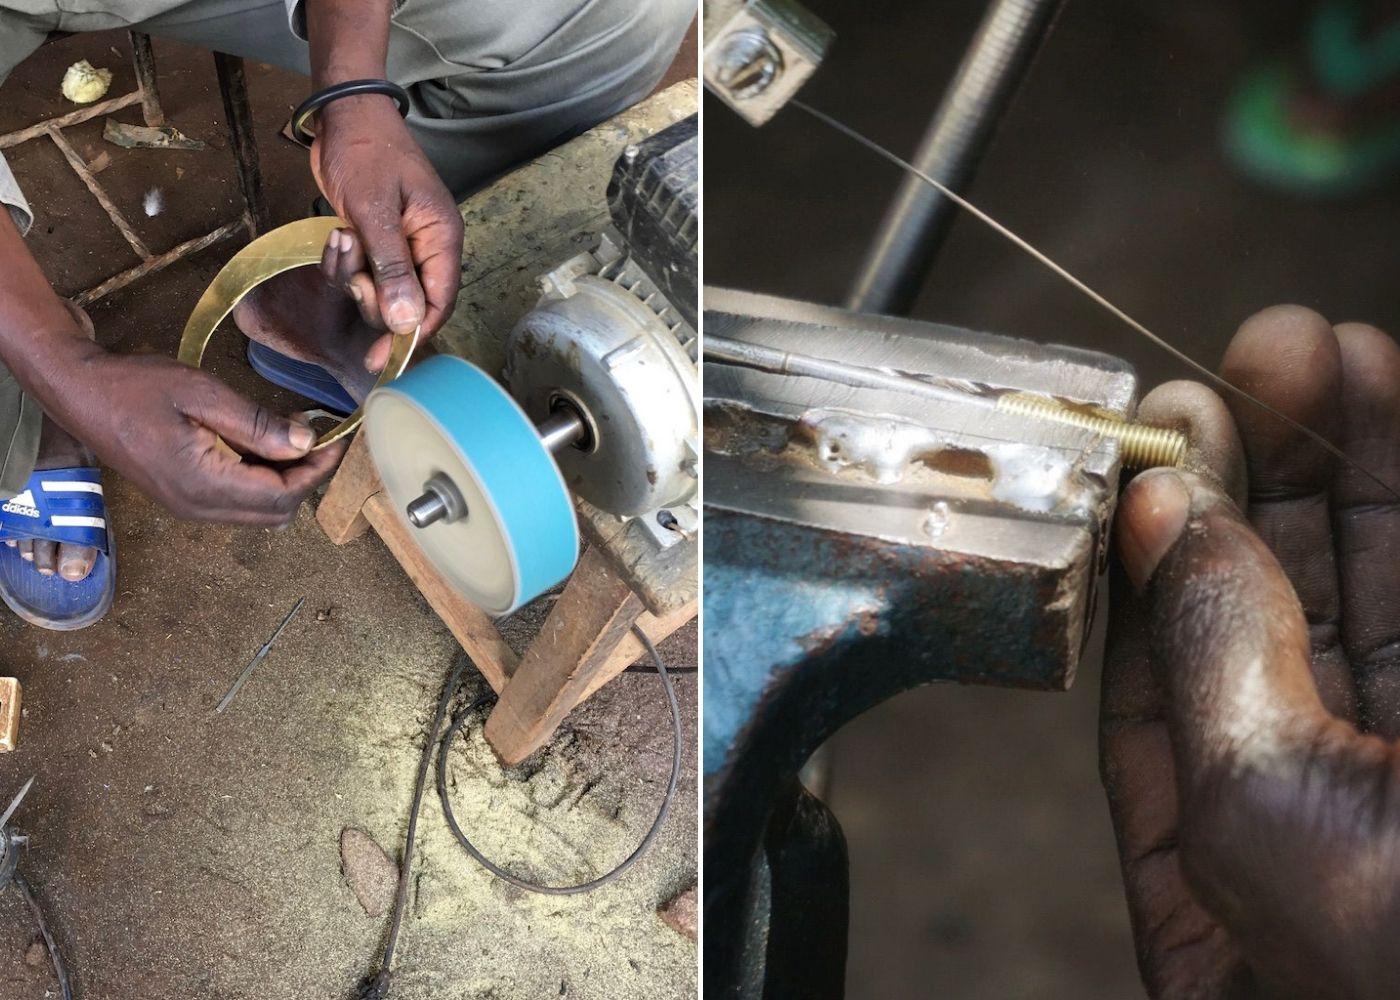 Artisans in Kenya working on jewellery for Ashepa Lifestyle